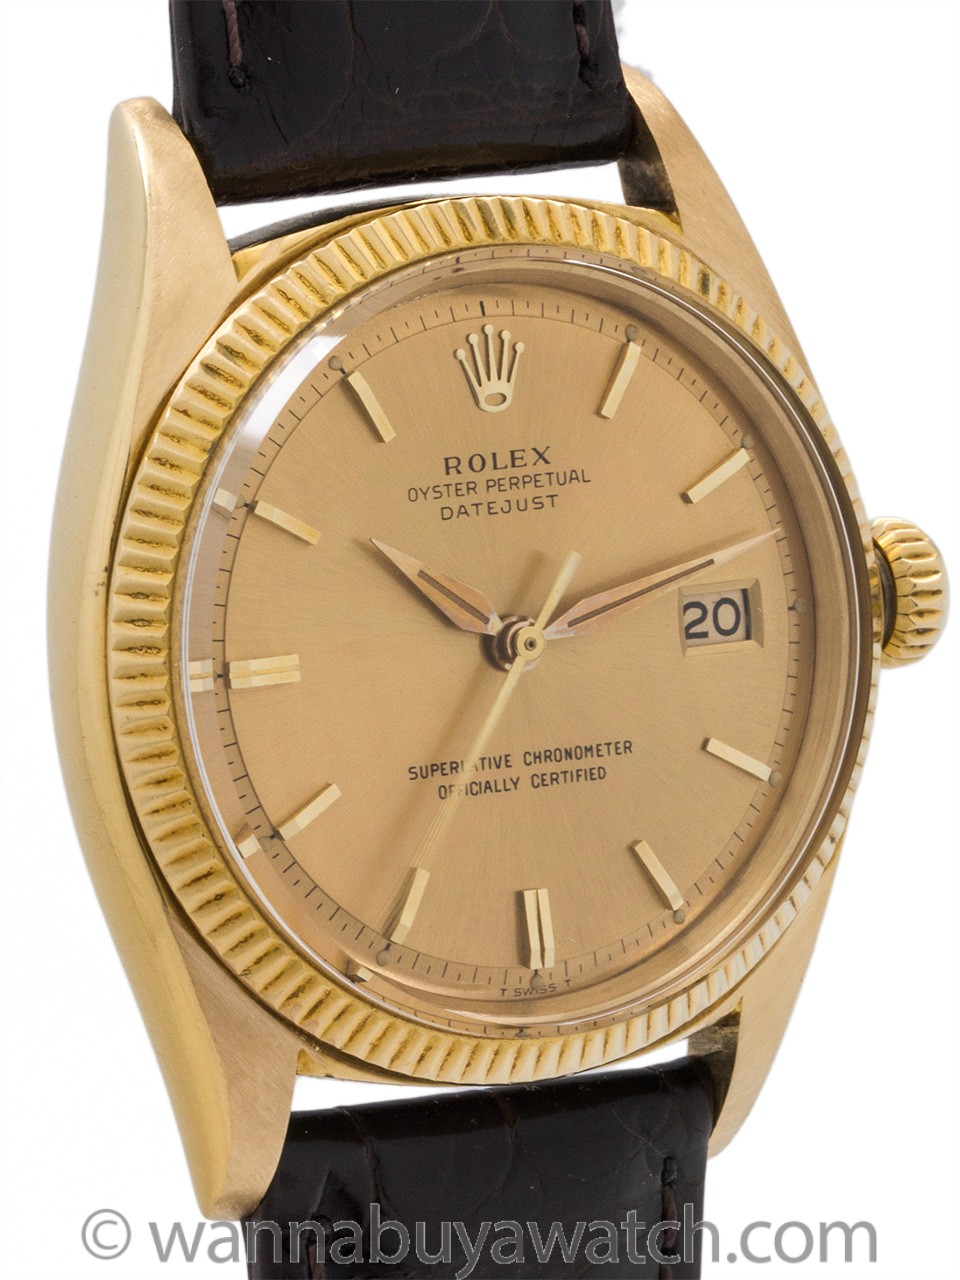 Rolex 18K Yellow Gold Datejust ref 1601 circa 1961